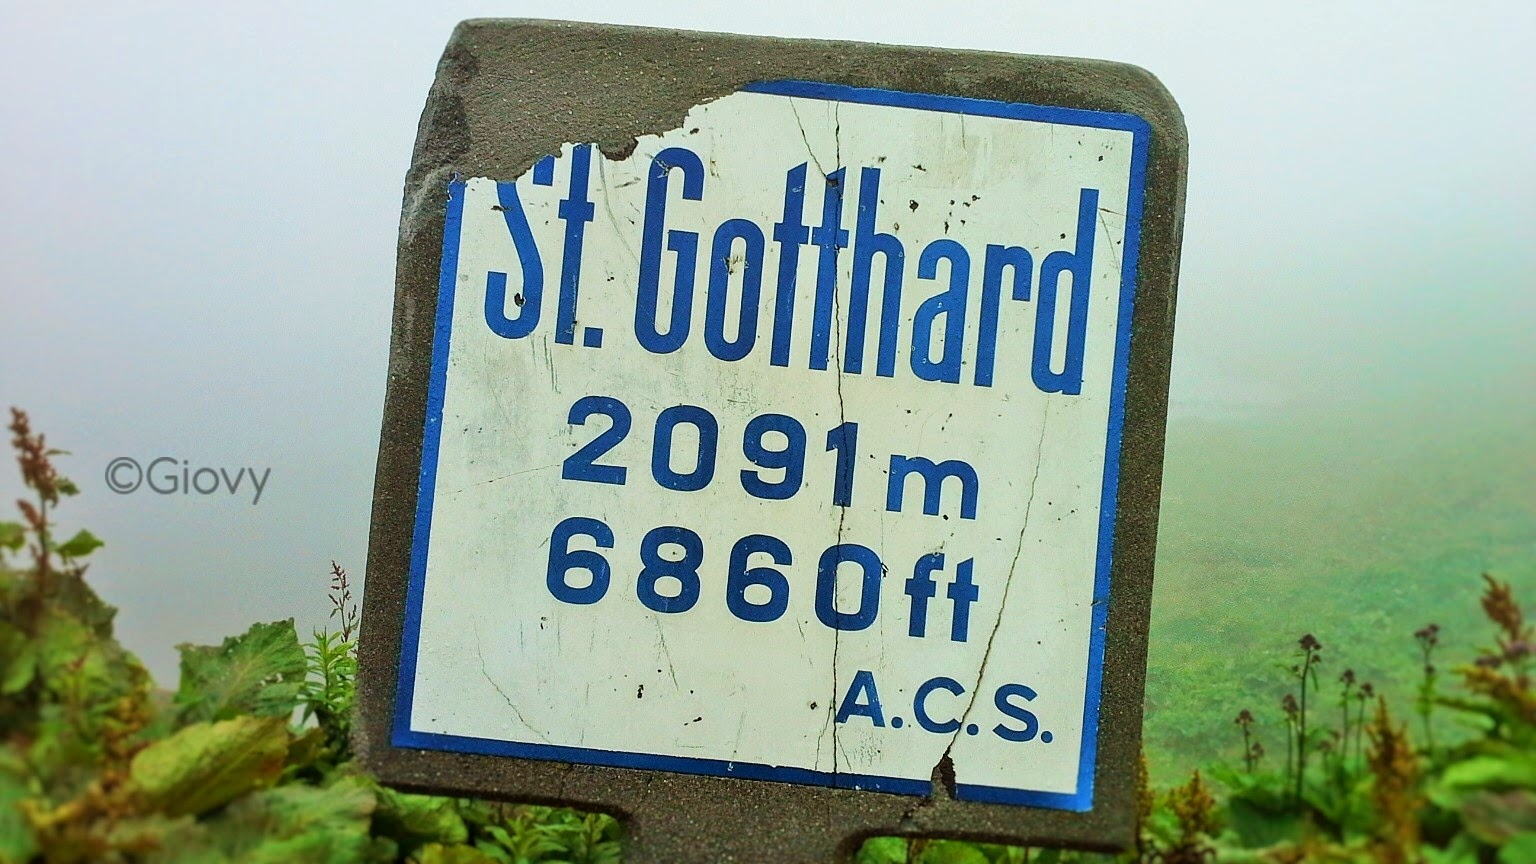 San Gottardo Svizzera